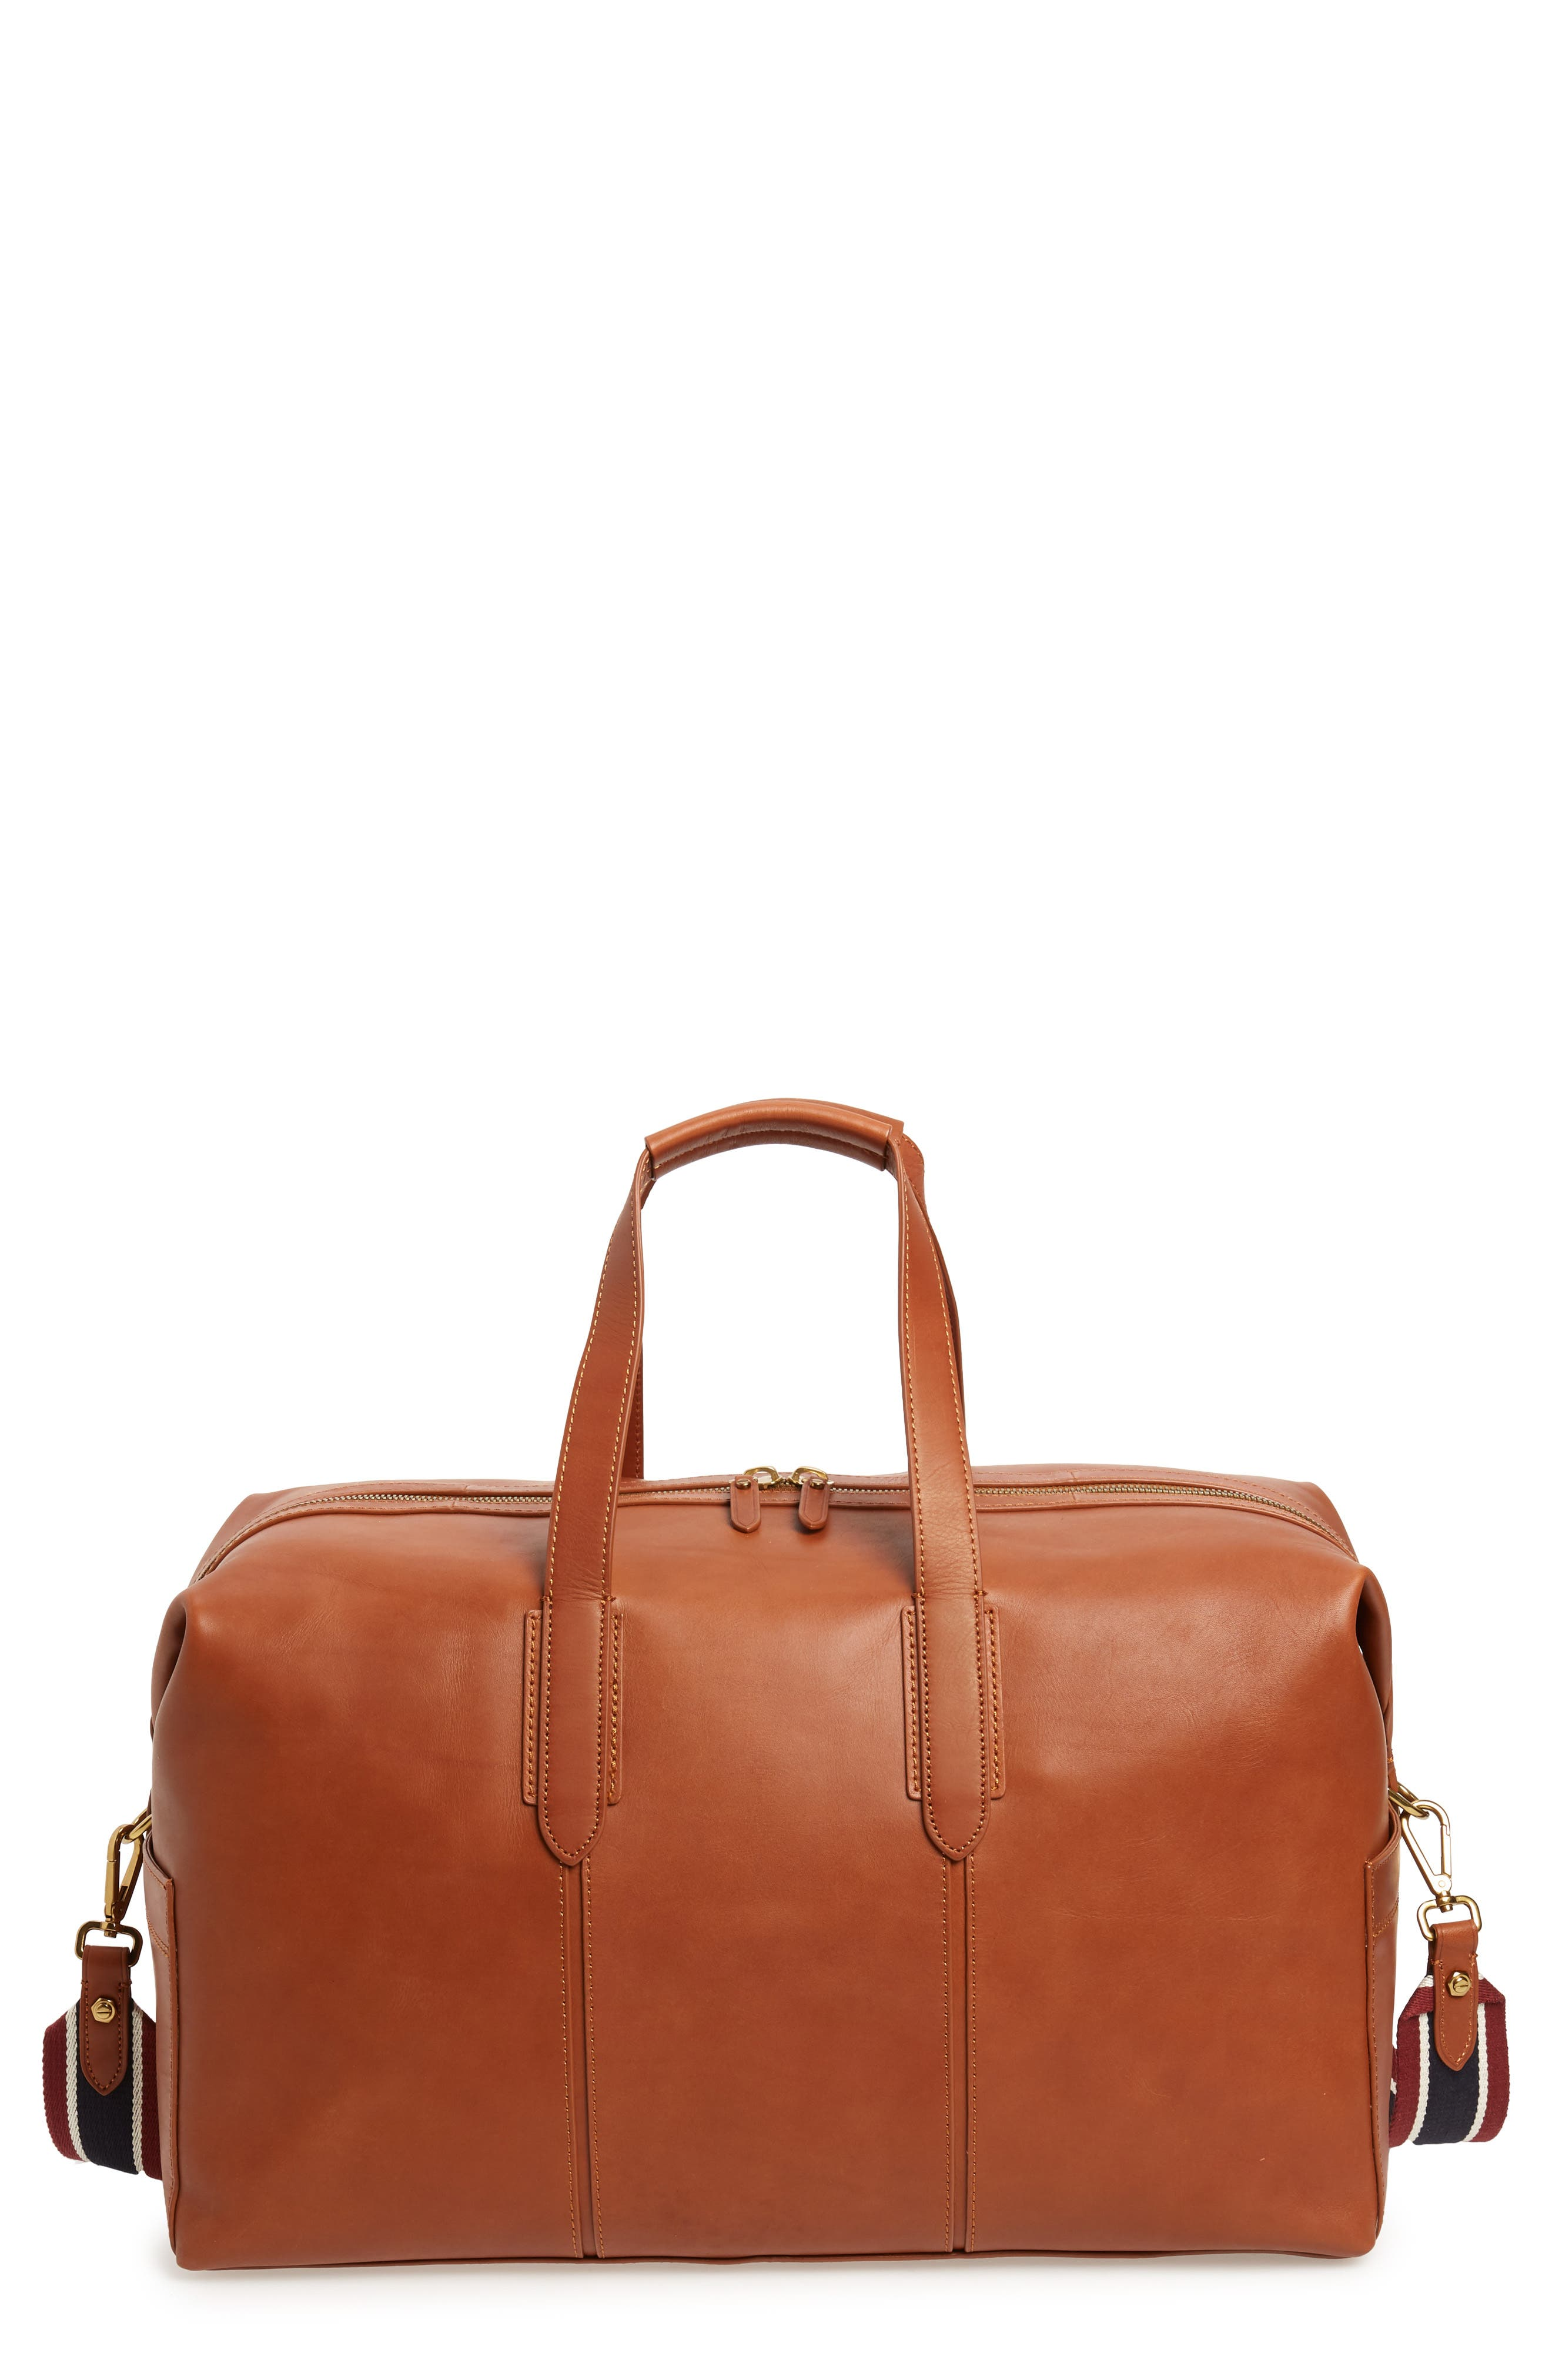 Oar Stripe Weekend Bag,                         Main,                         color, BURNISHED SIENNA